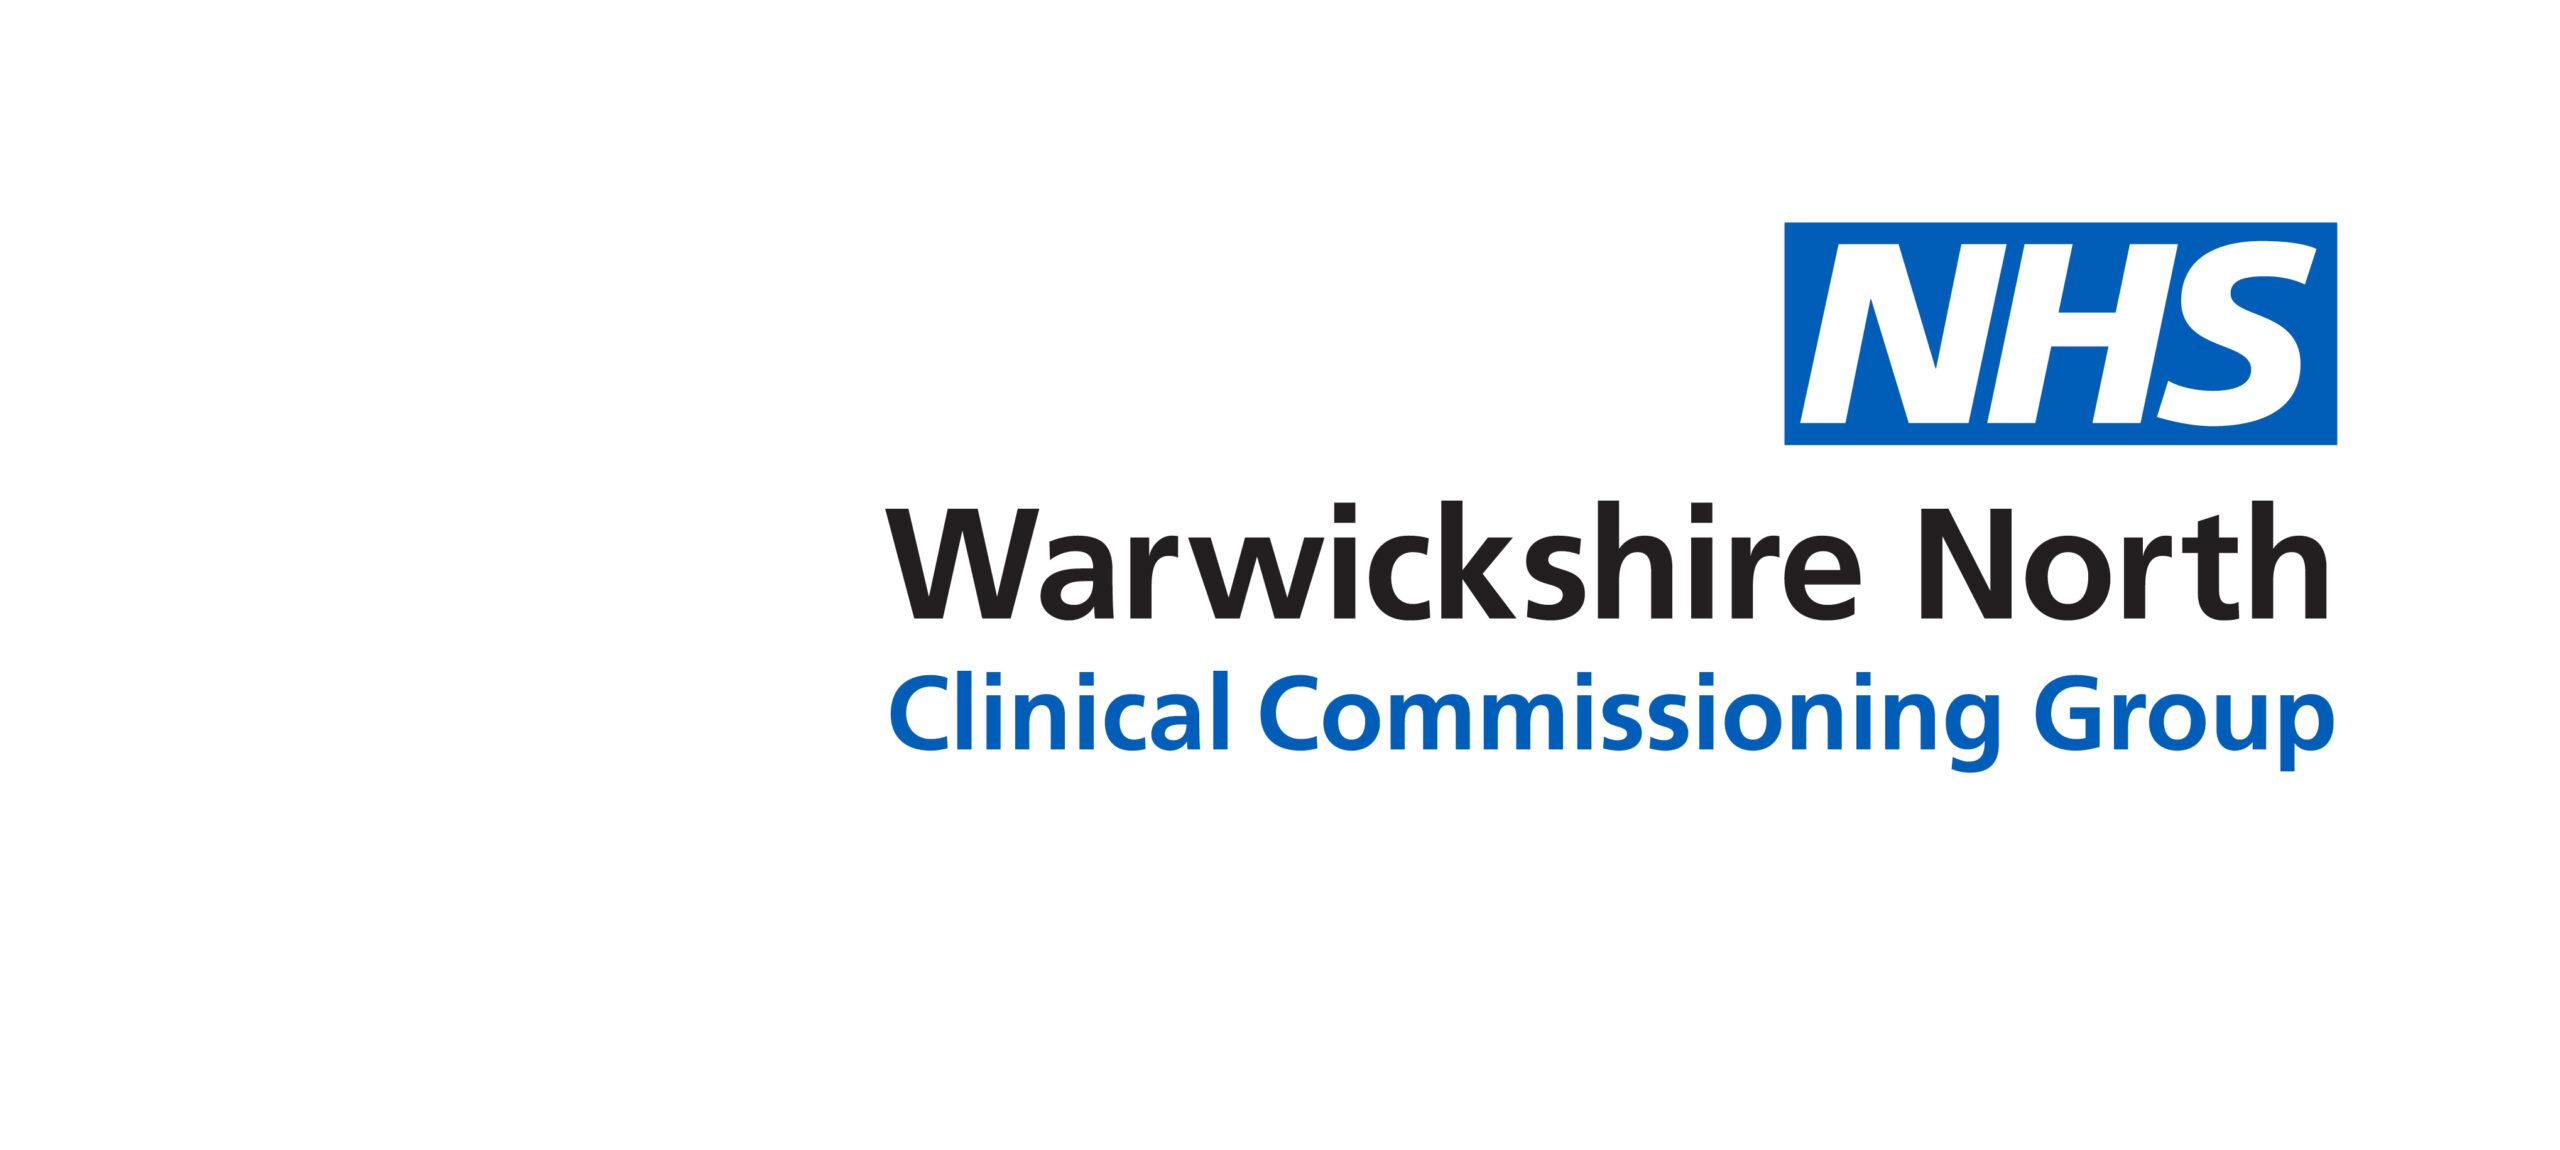 Warwickshire North CCG ÔÇô RGB Blue